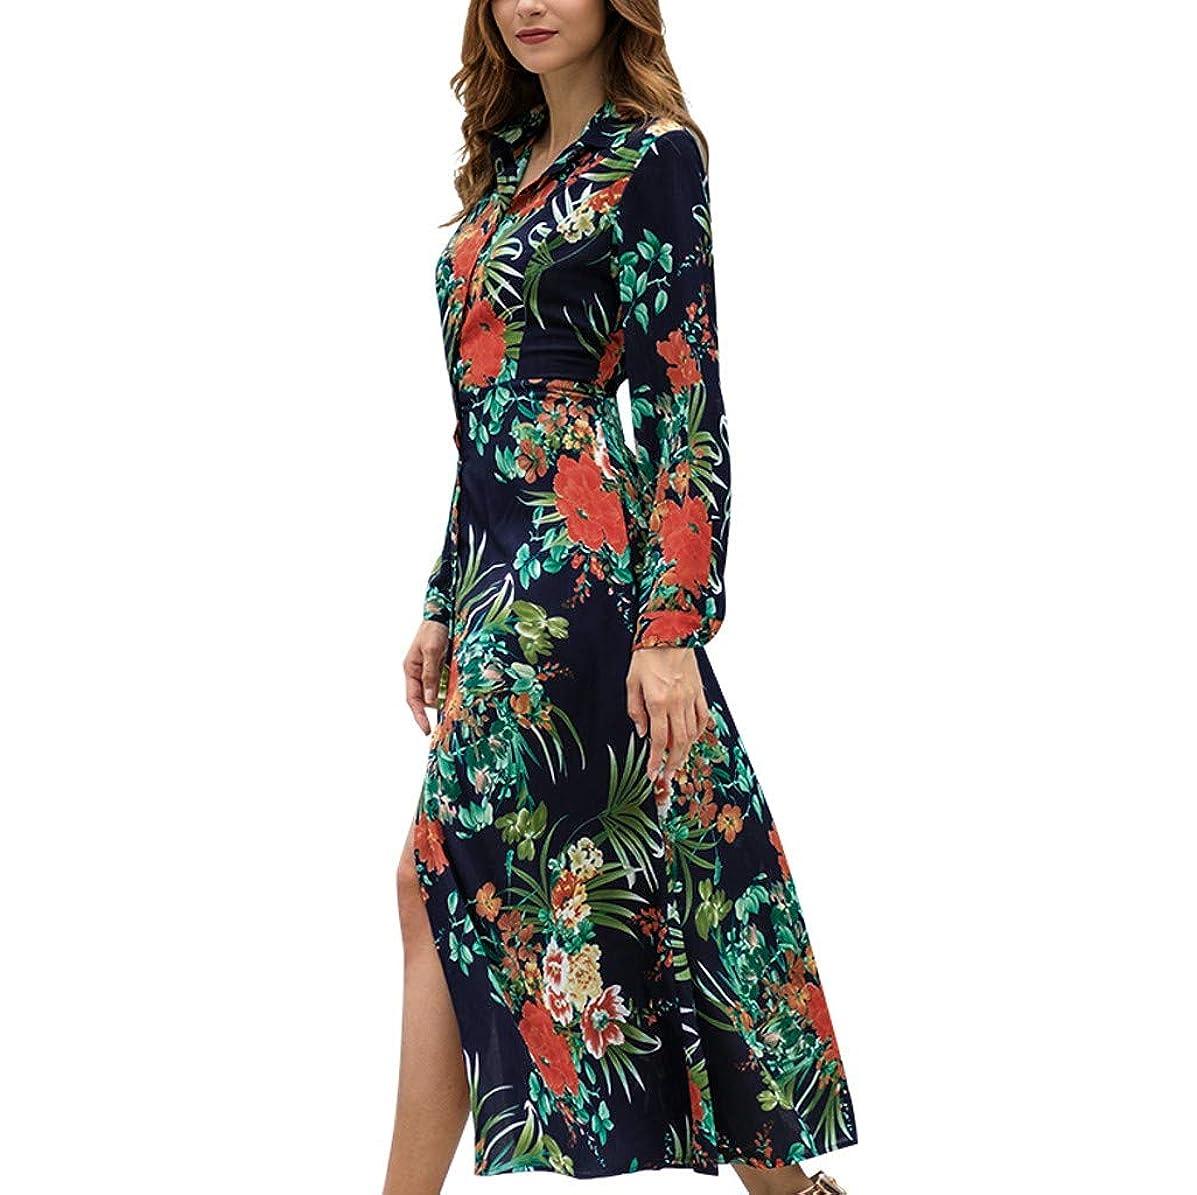 Women Elegant Shirt Dress Button Down V Neck Floral Print Maxi Dress Split High Waist Long Sleeve Party Dress by Lowprofile